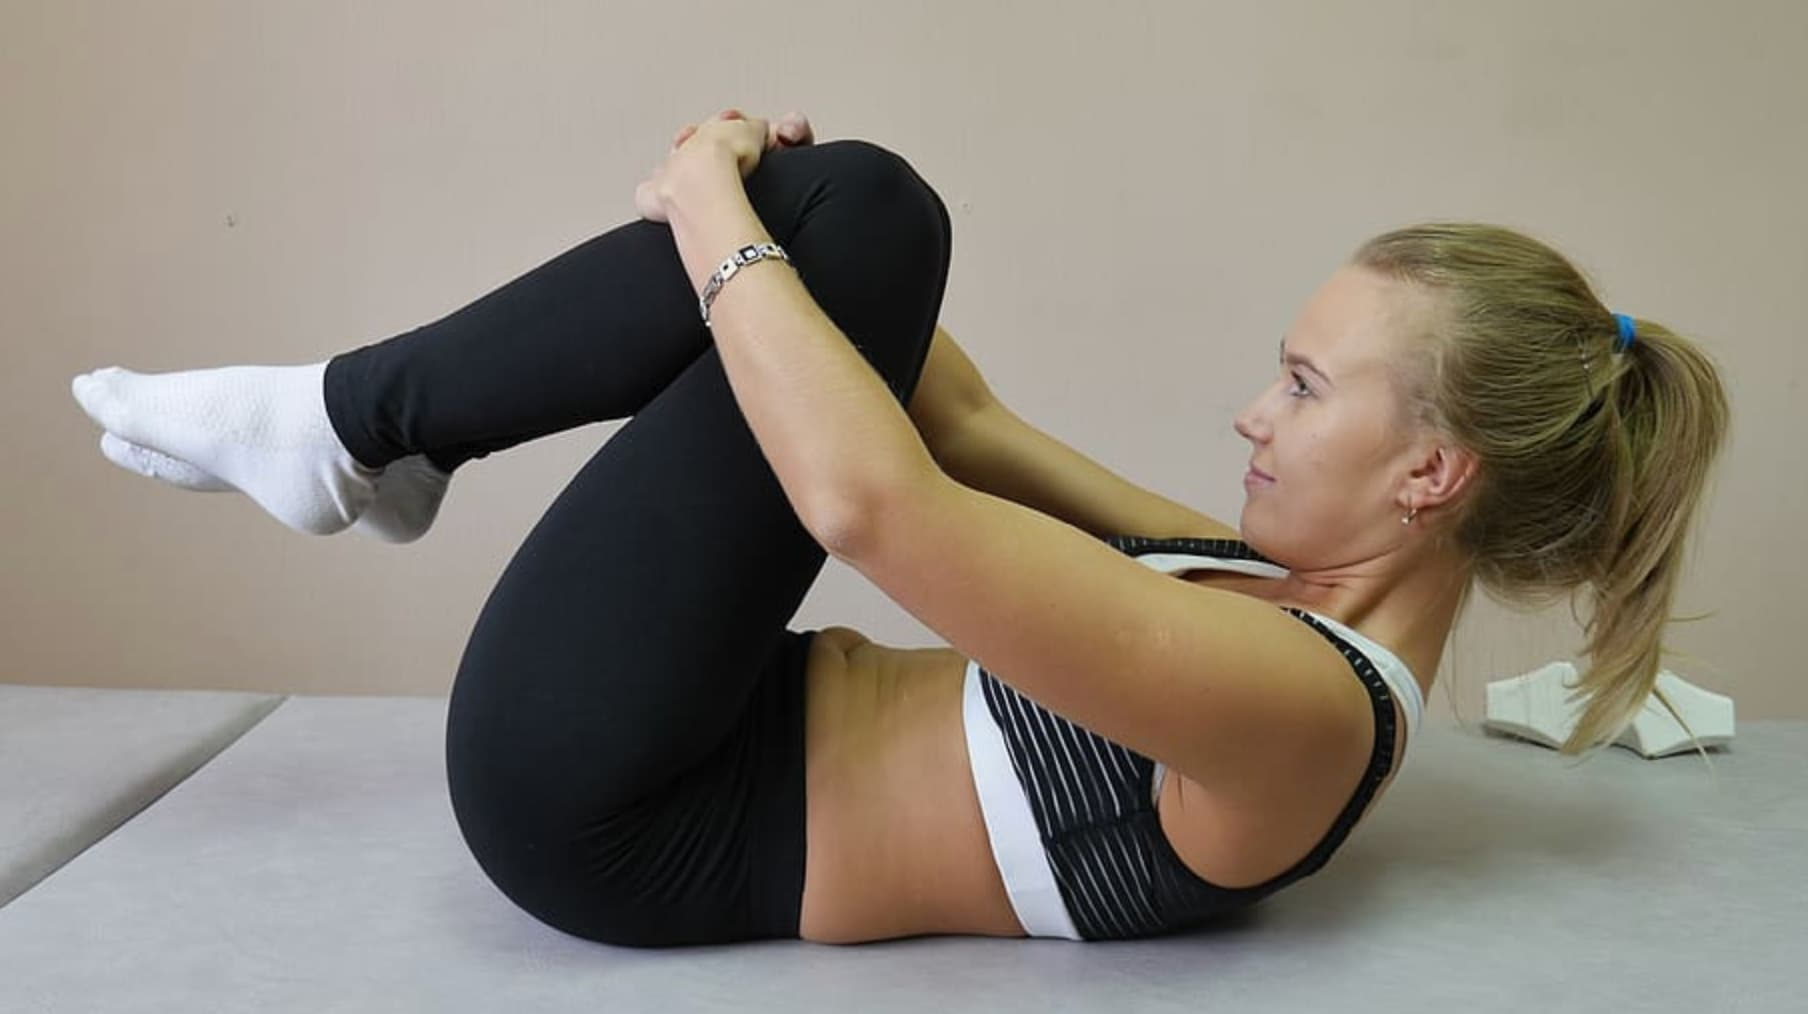 Mejora la flexibilidad de tu columna vertebral